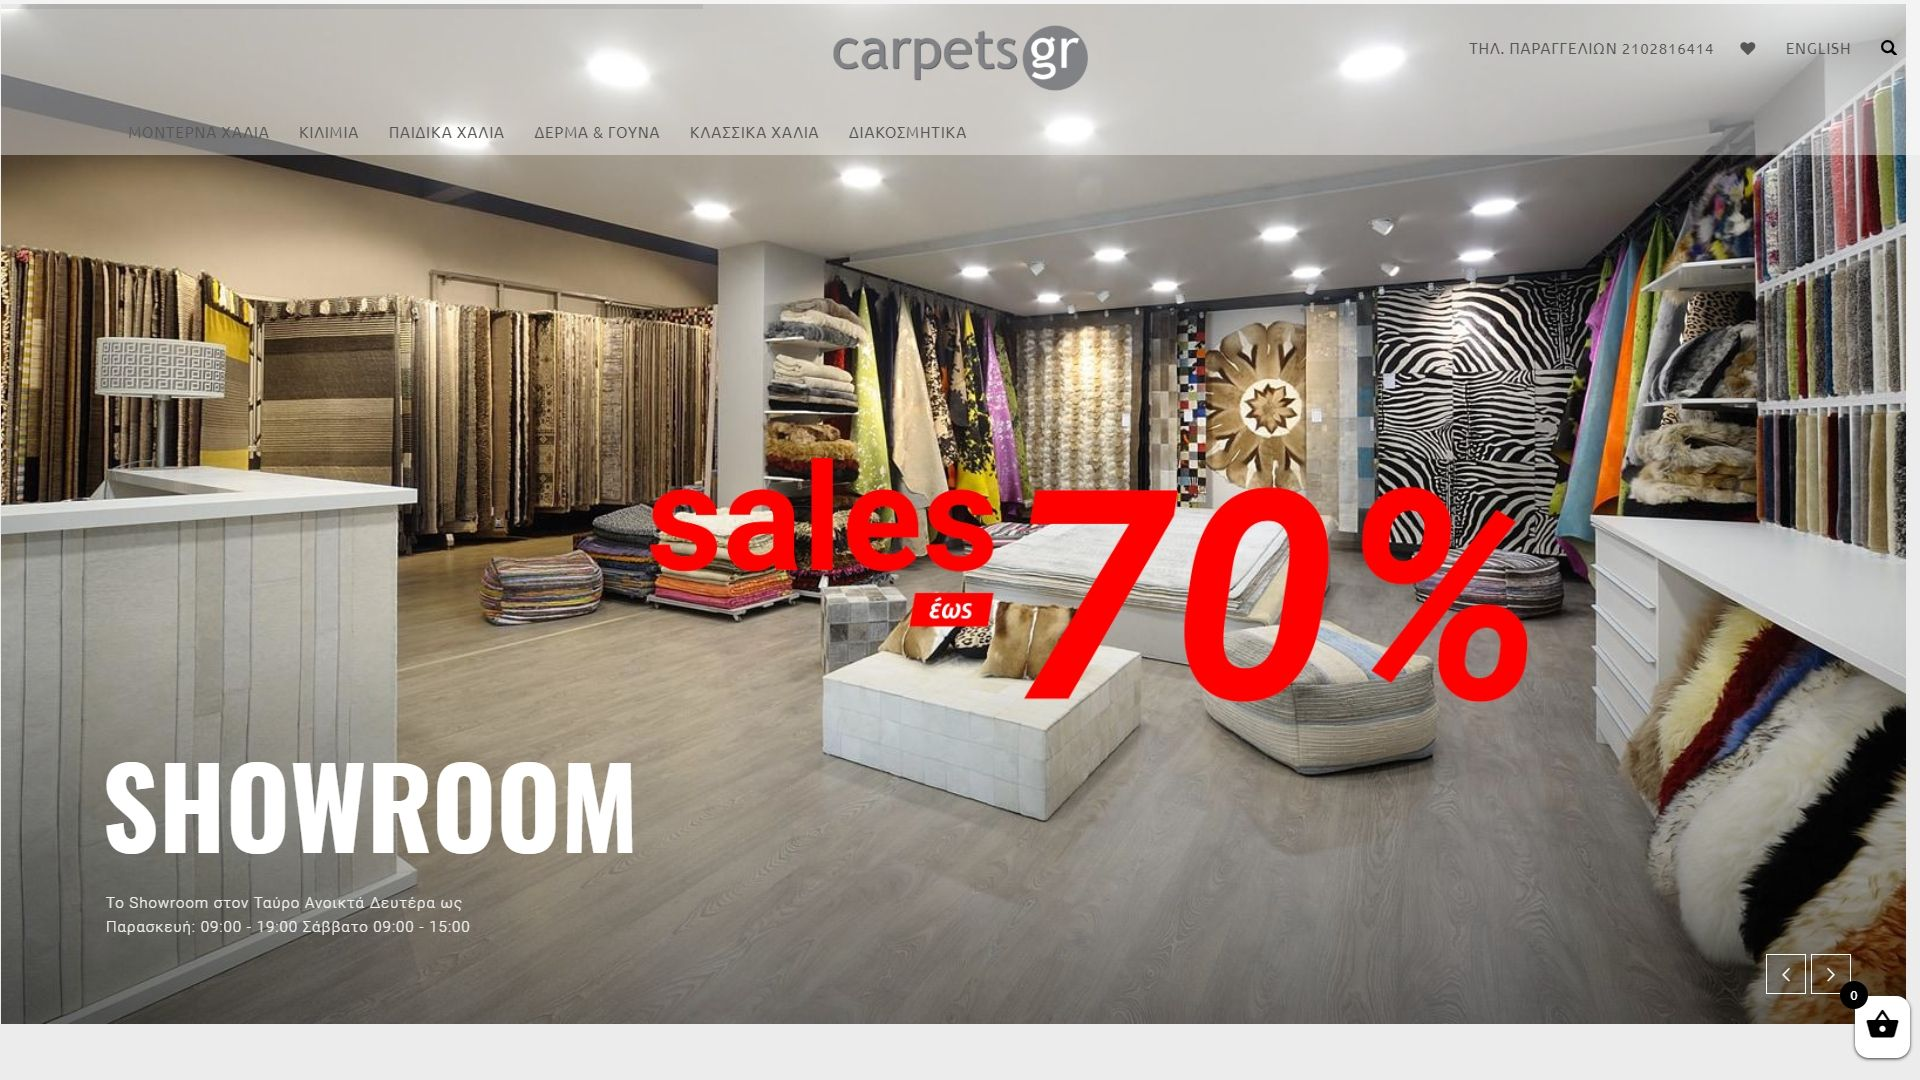 Our Works - Carpets.gr